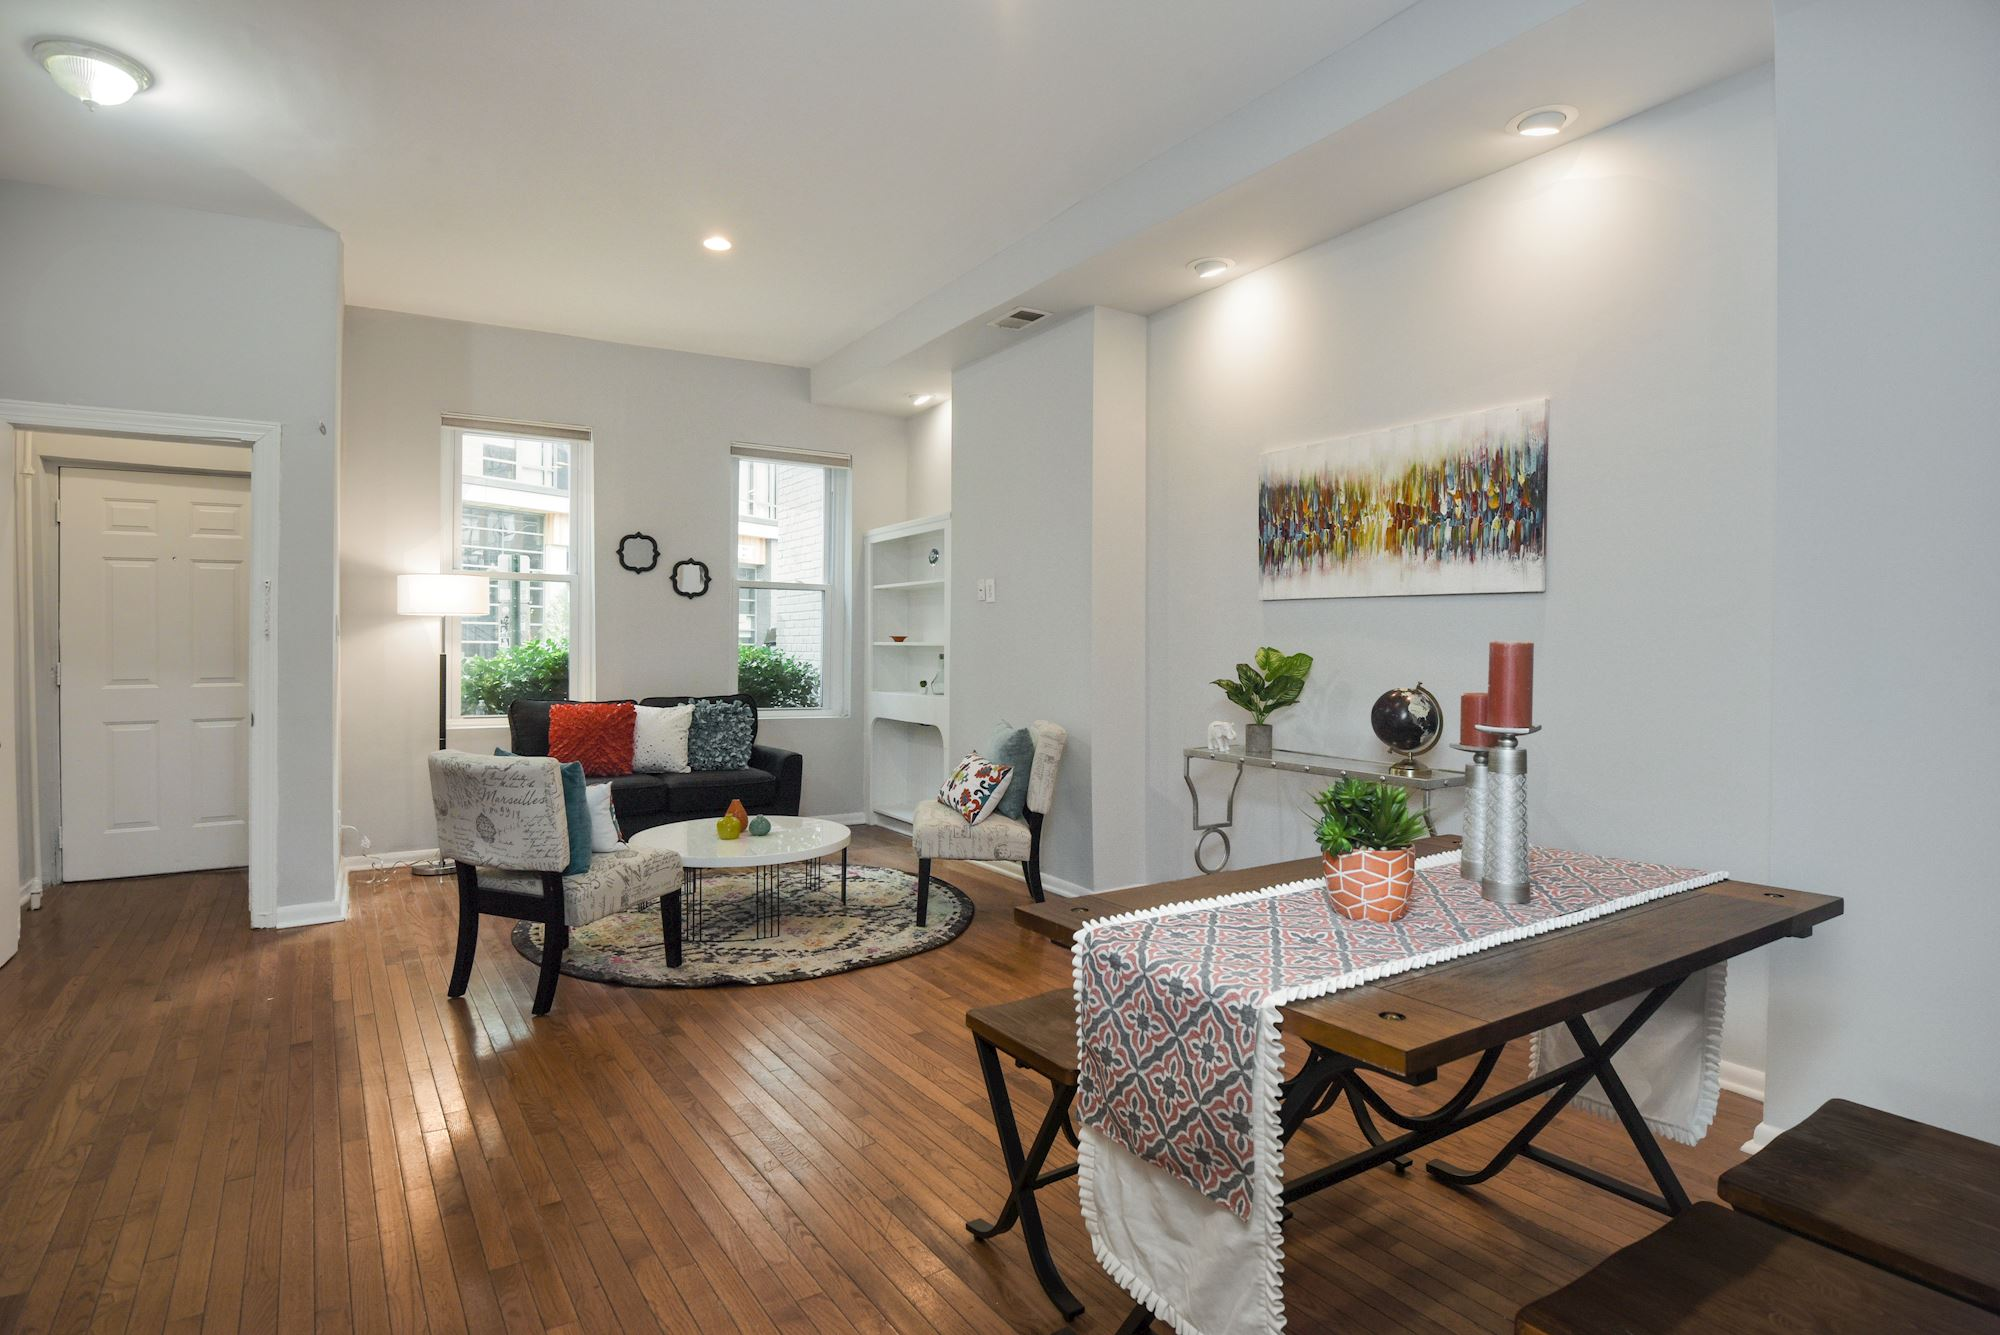 Fantastic 3 BD End Unit Row Home in Shaw Neighborhood, Washington DC